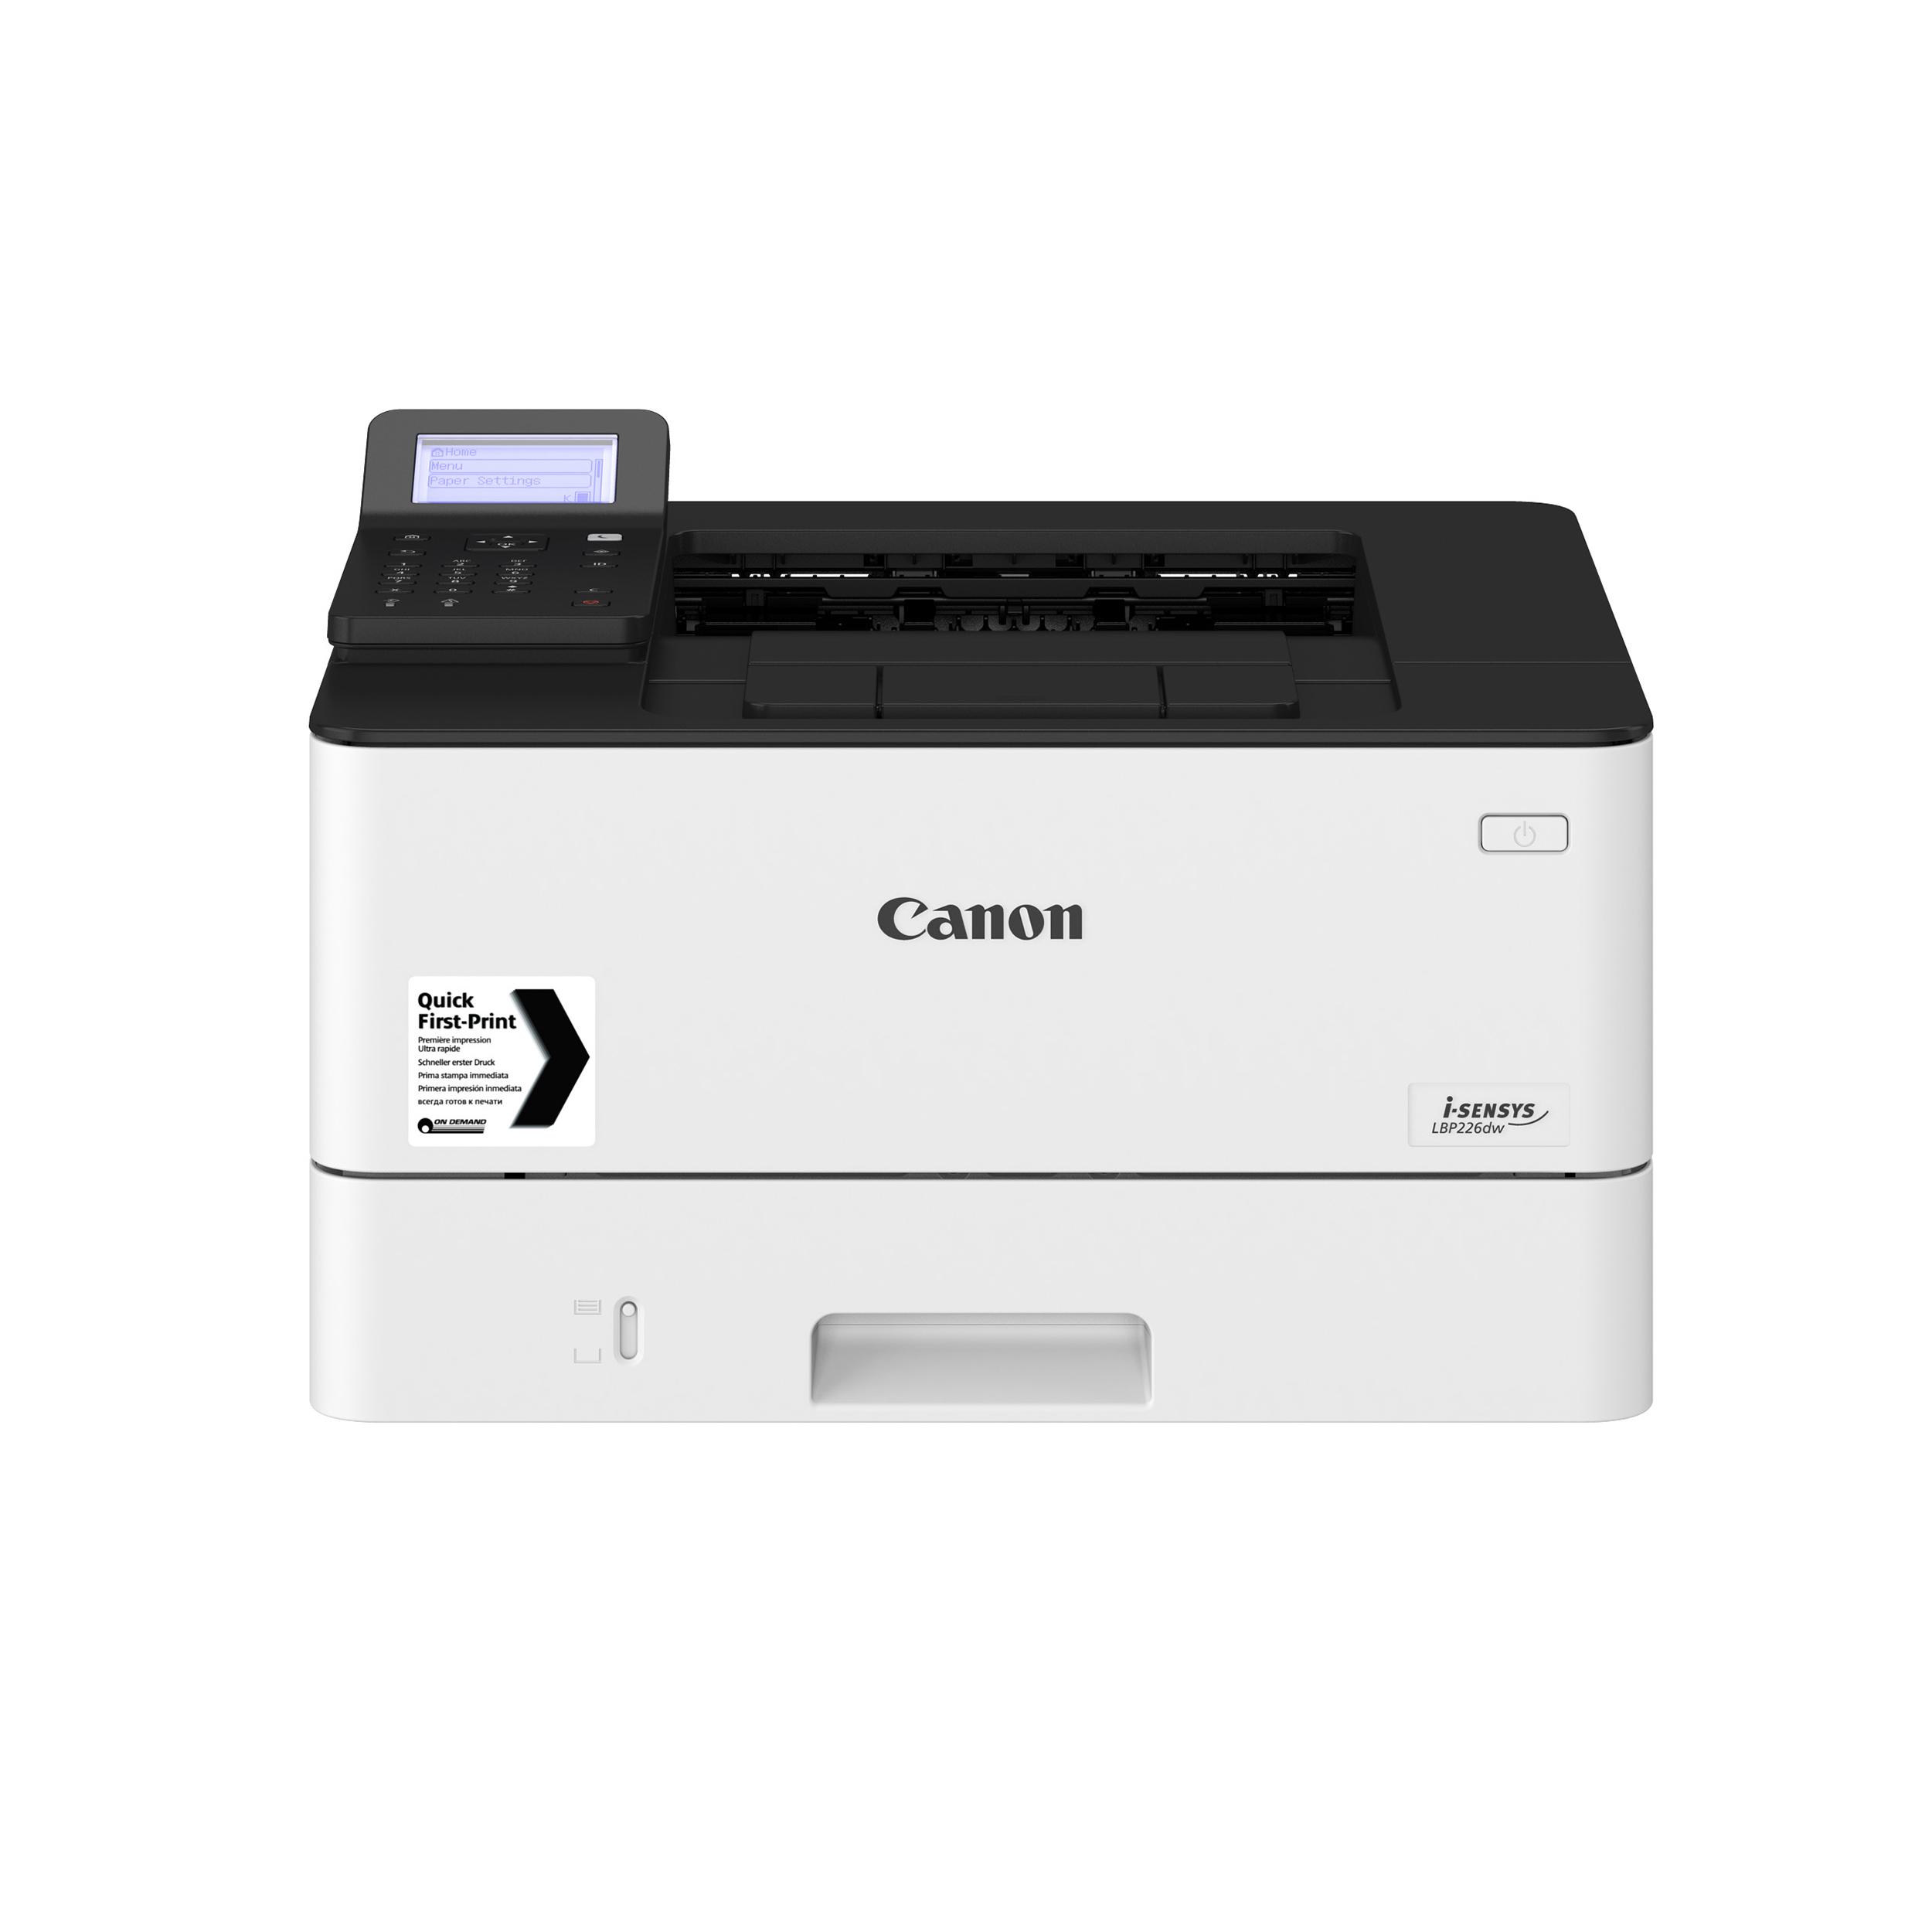 Canon i-SENSYS LBP226dw Mono Laser A4 Printer Ref 3516C019AA